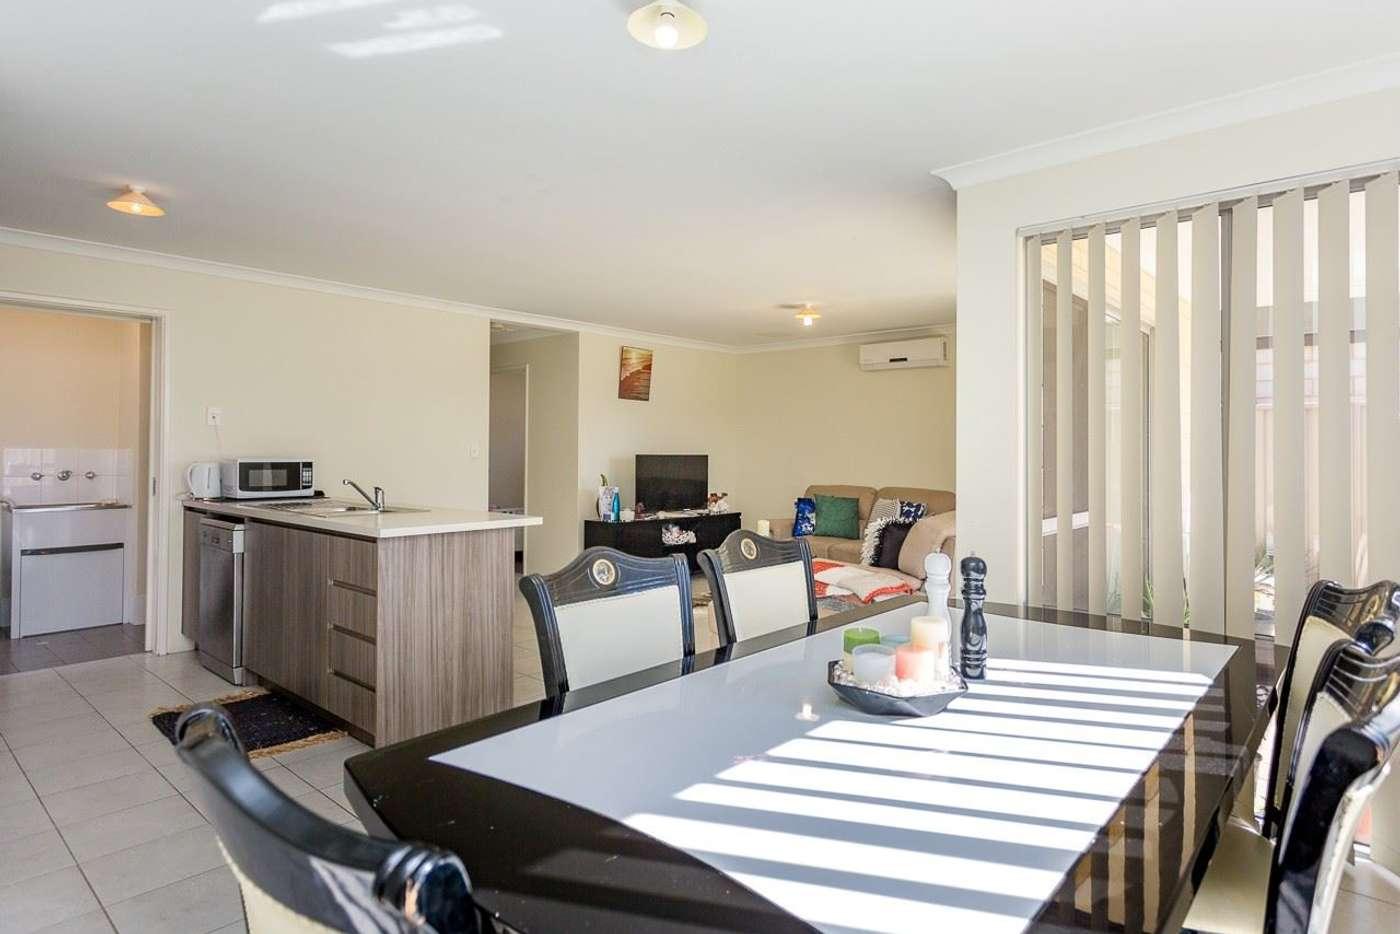 Main view of Homely house listing, 36 Panozza Circle, Maddington WA 6109